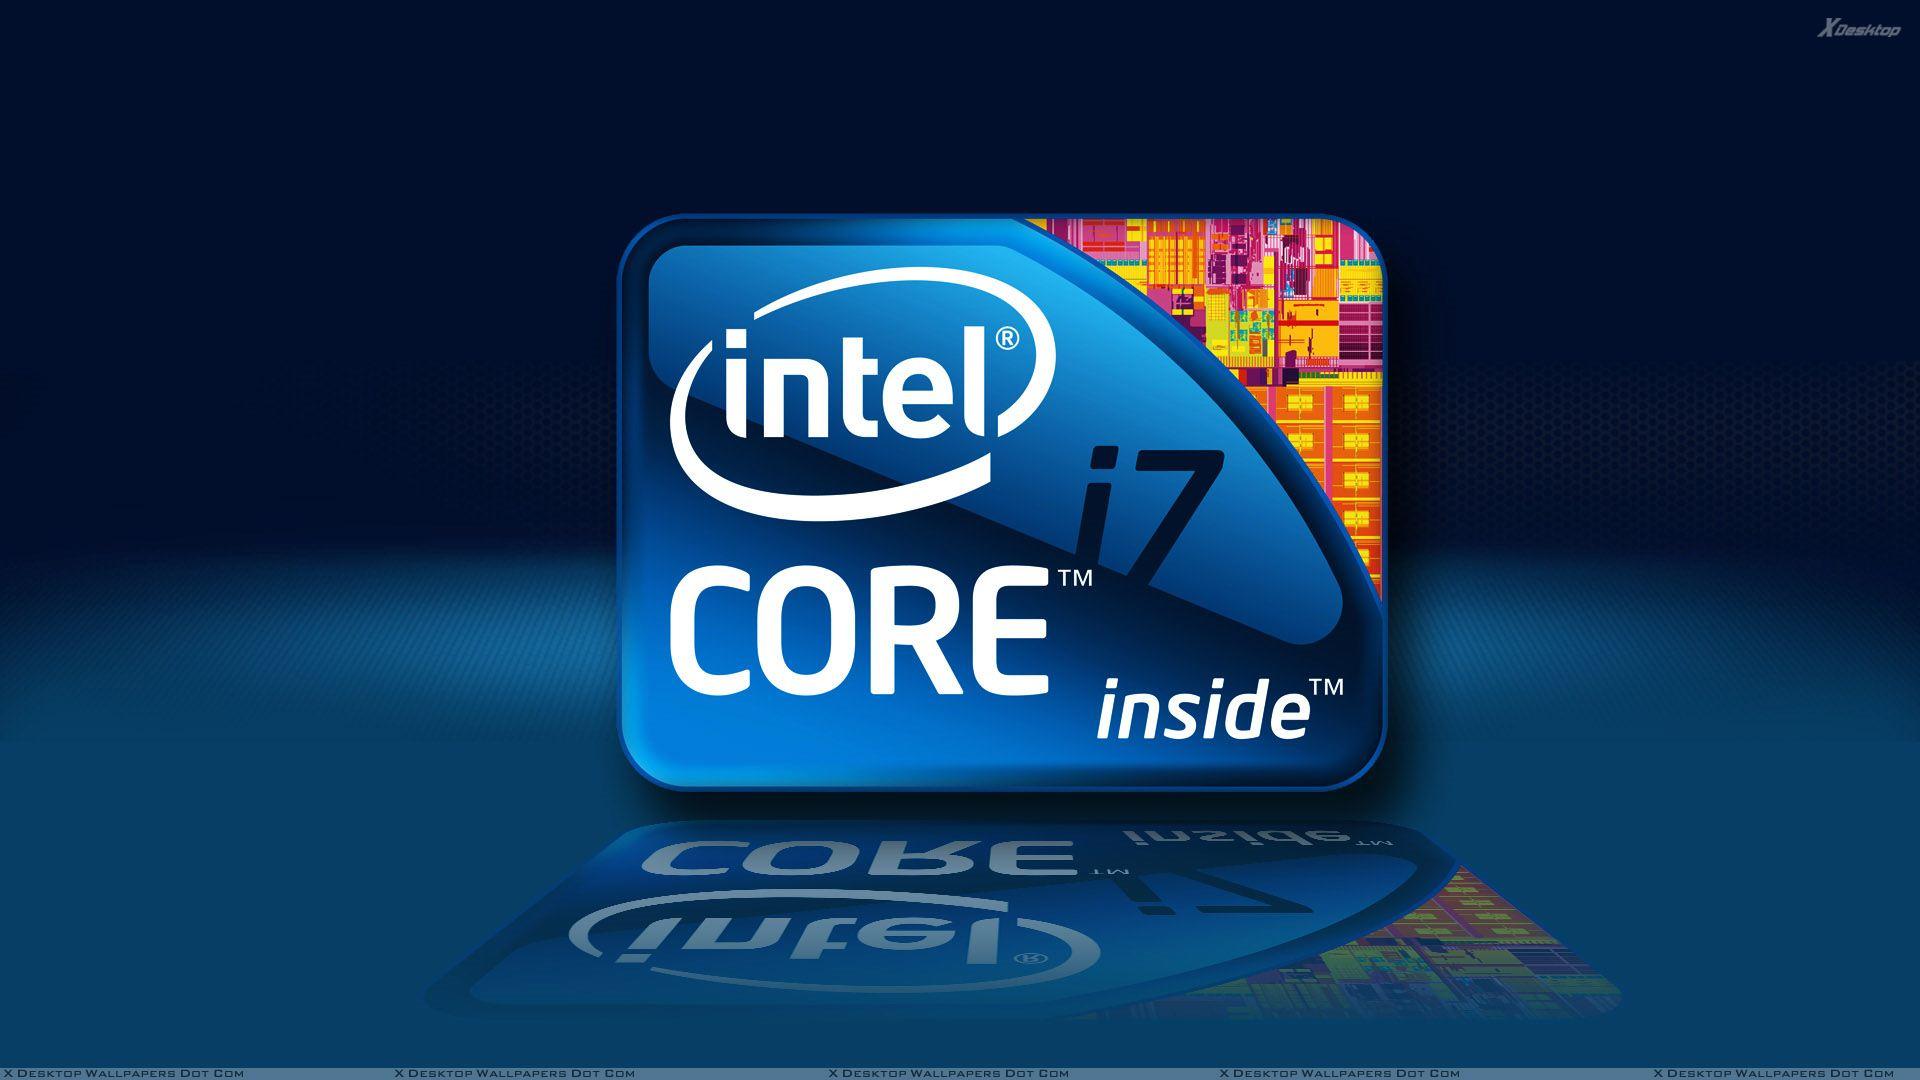 Intel Core i7 Processor On Blue Background Wallpaper 1920x1080